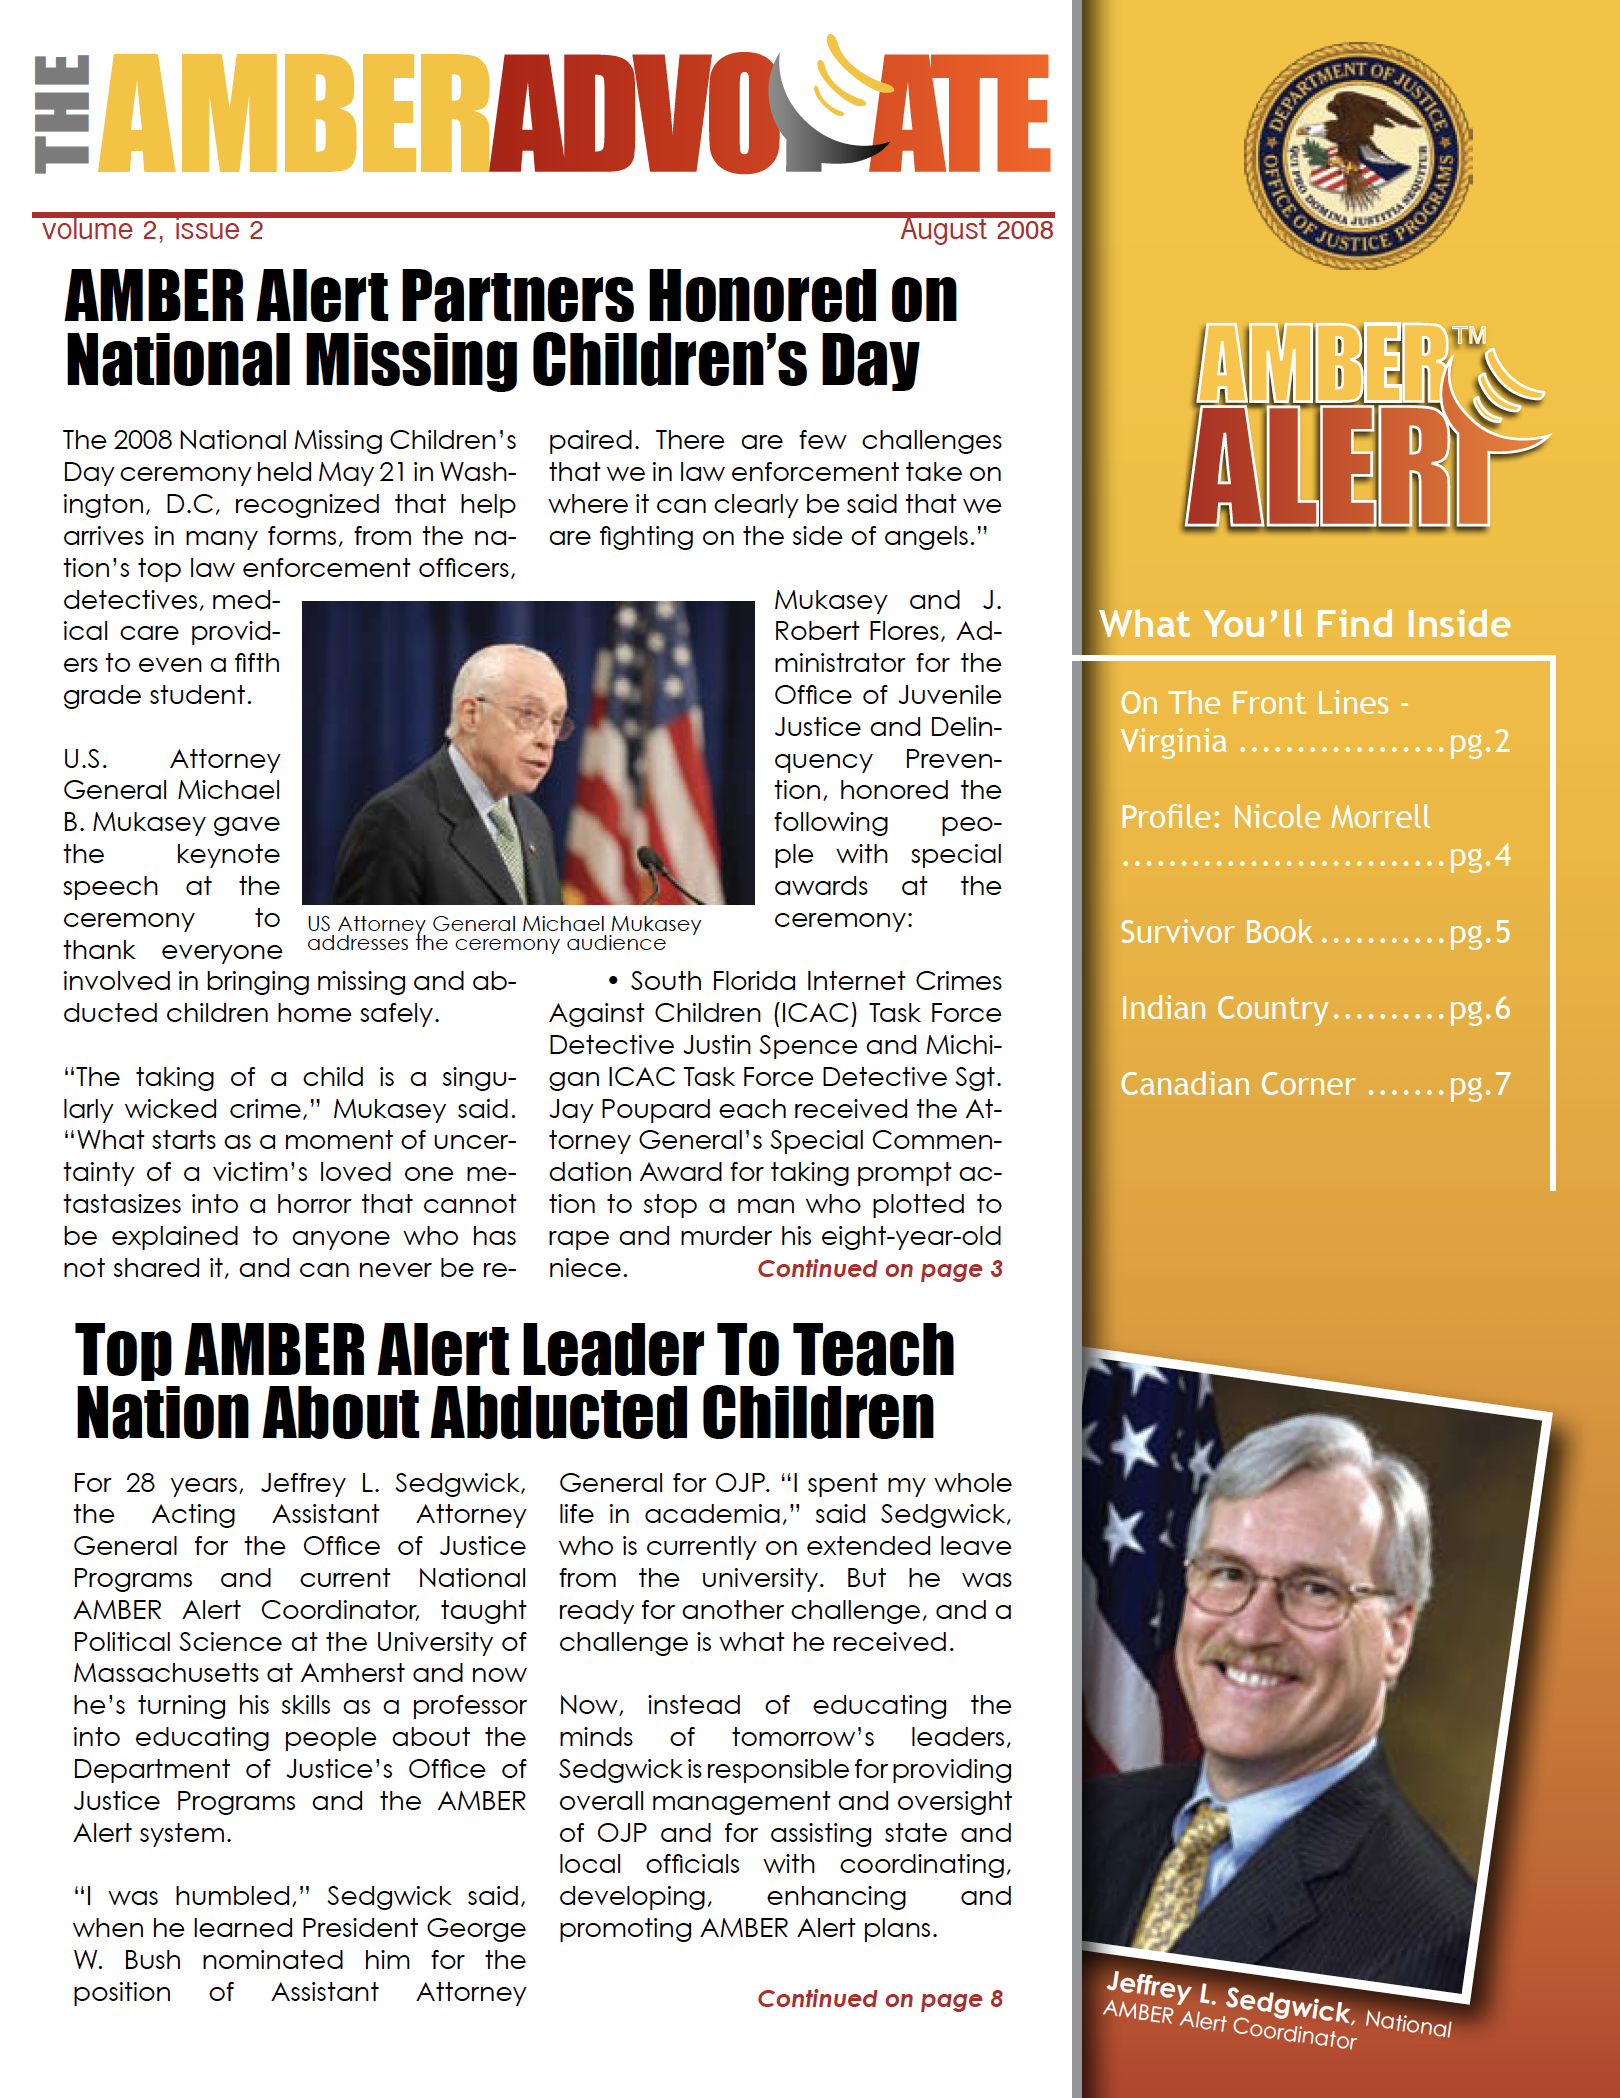 AMBER Advocate 6 cover